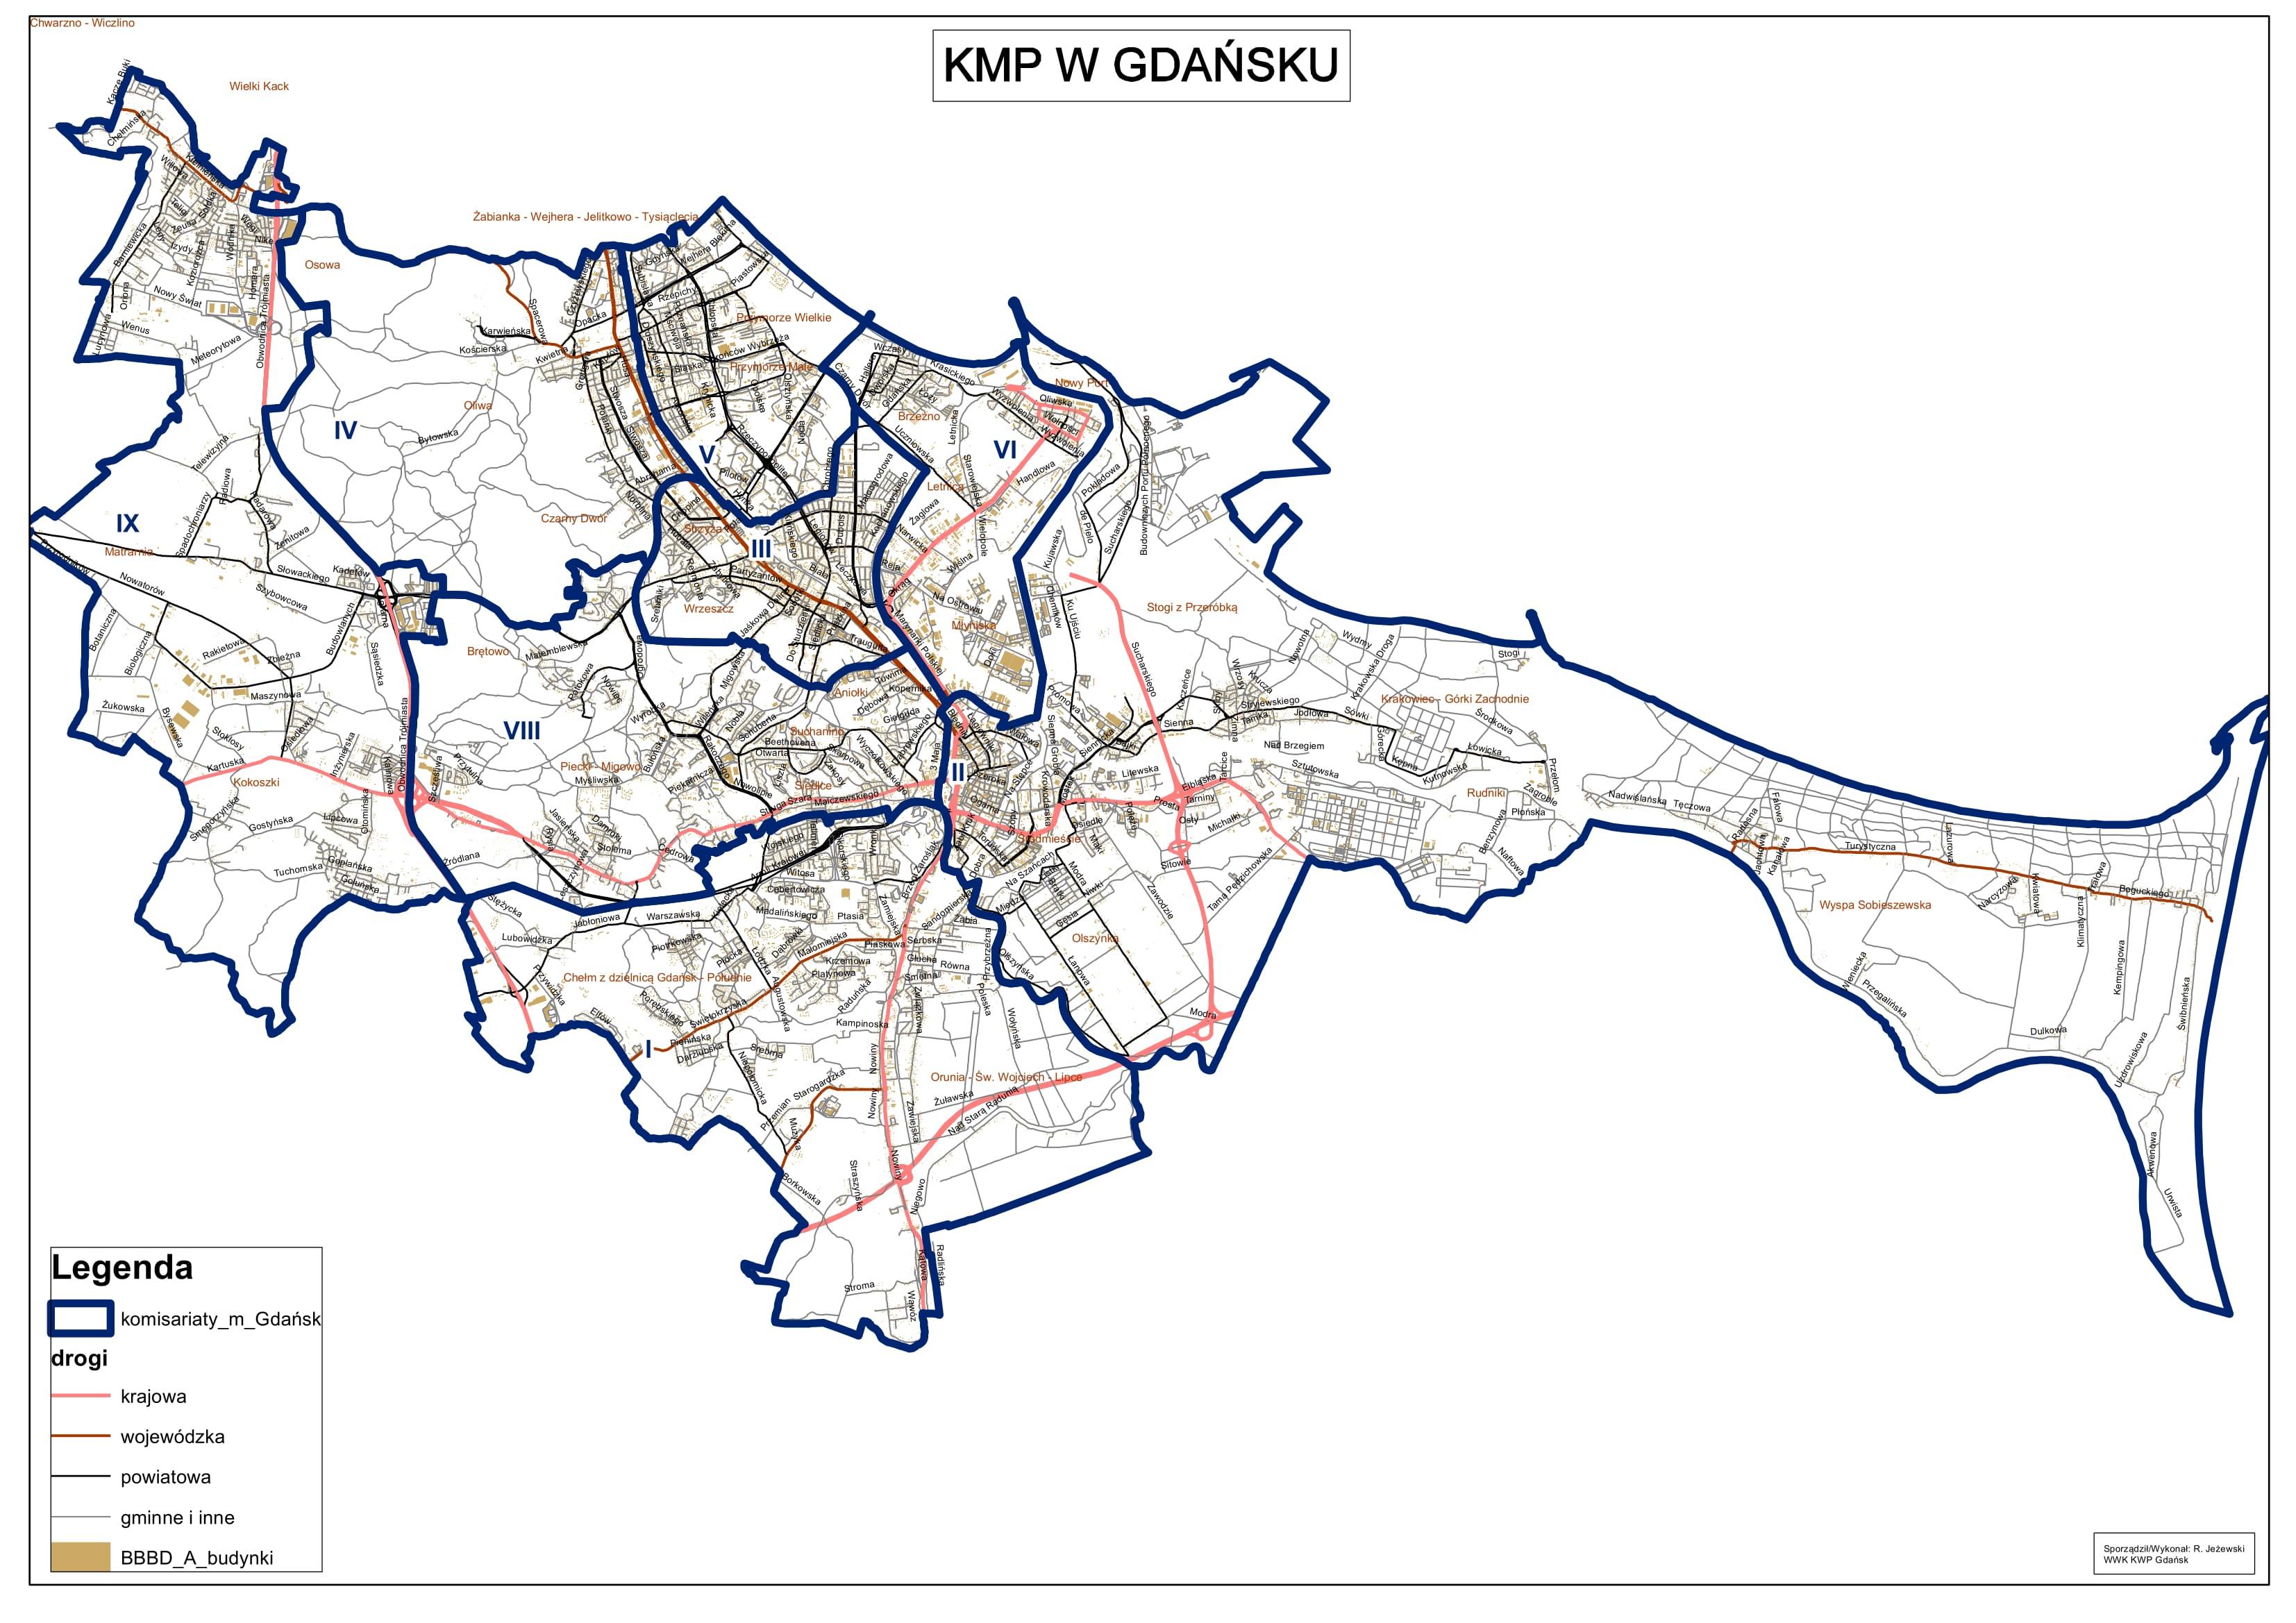 Mapa Podzial Komisariatow Mapa Podzial Komisariatow